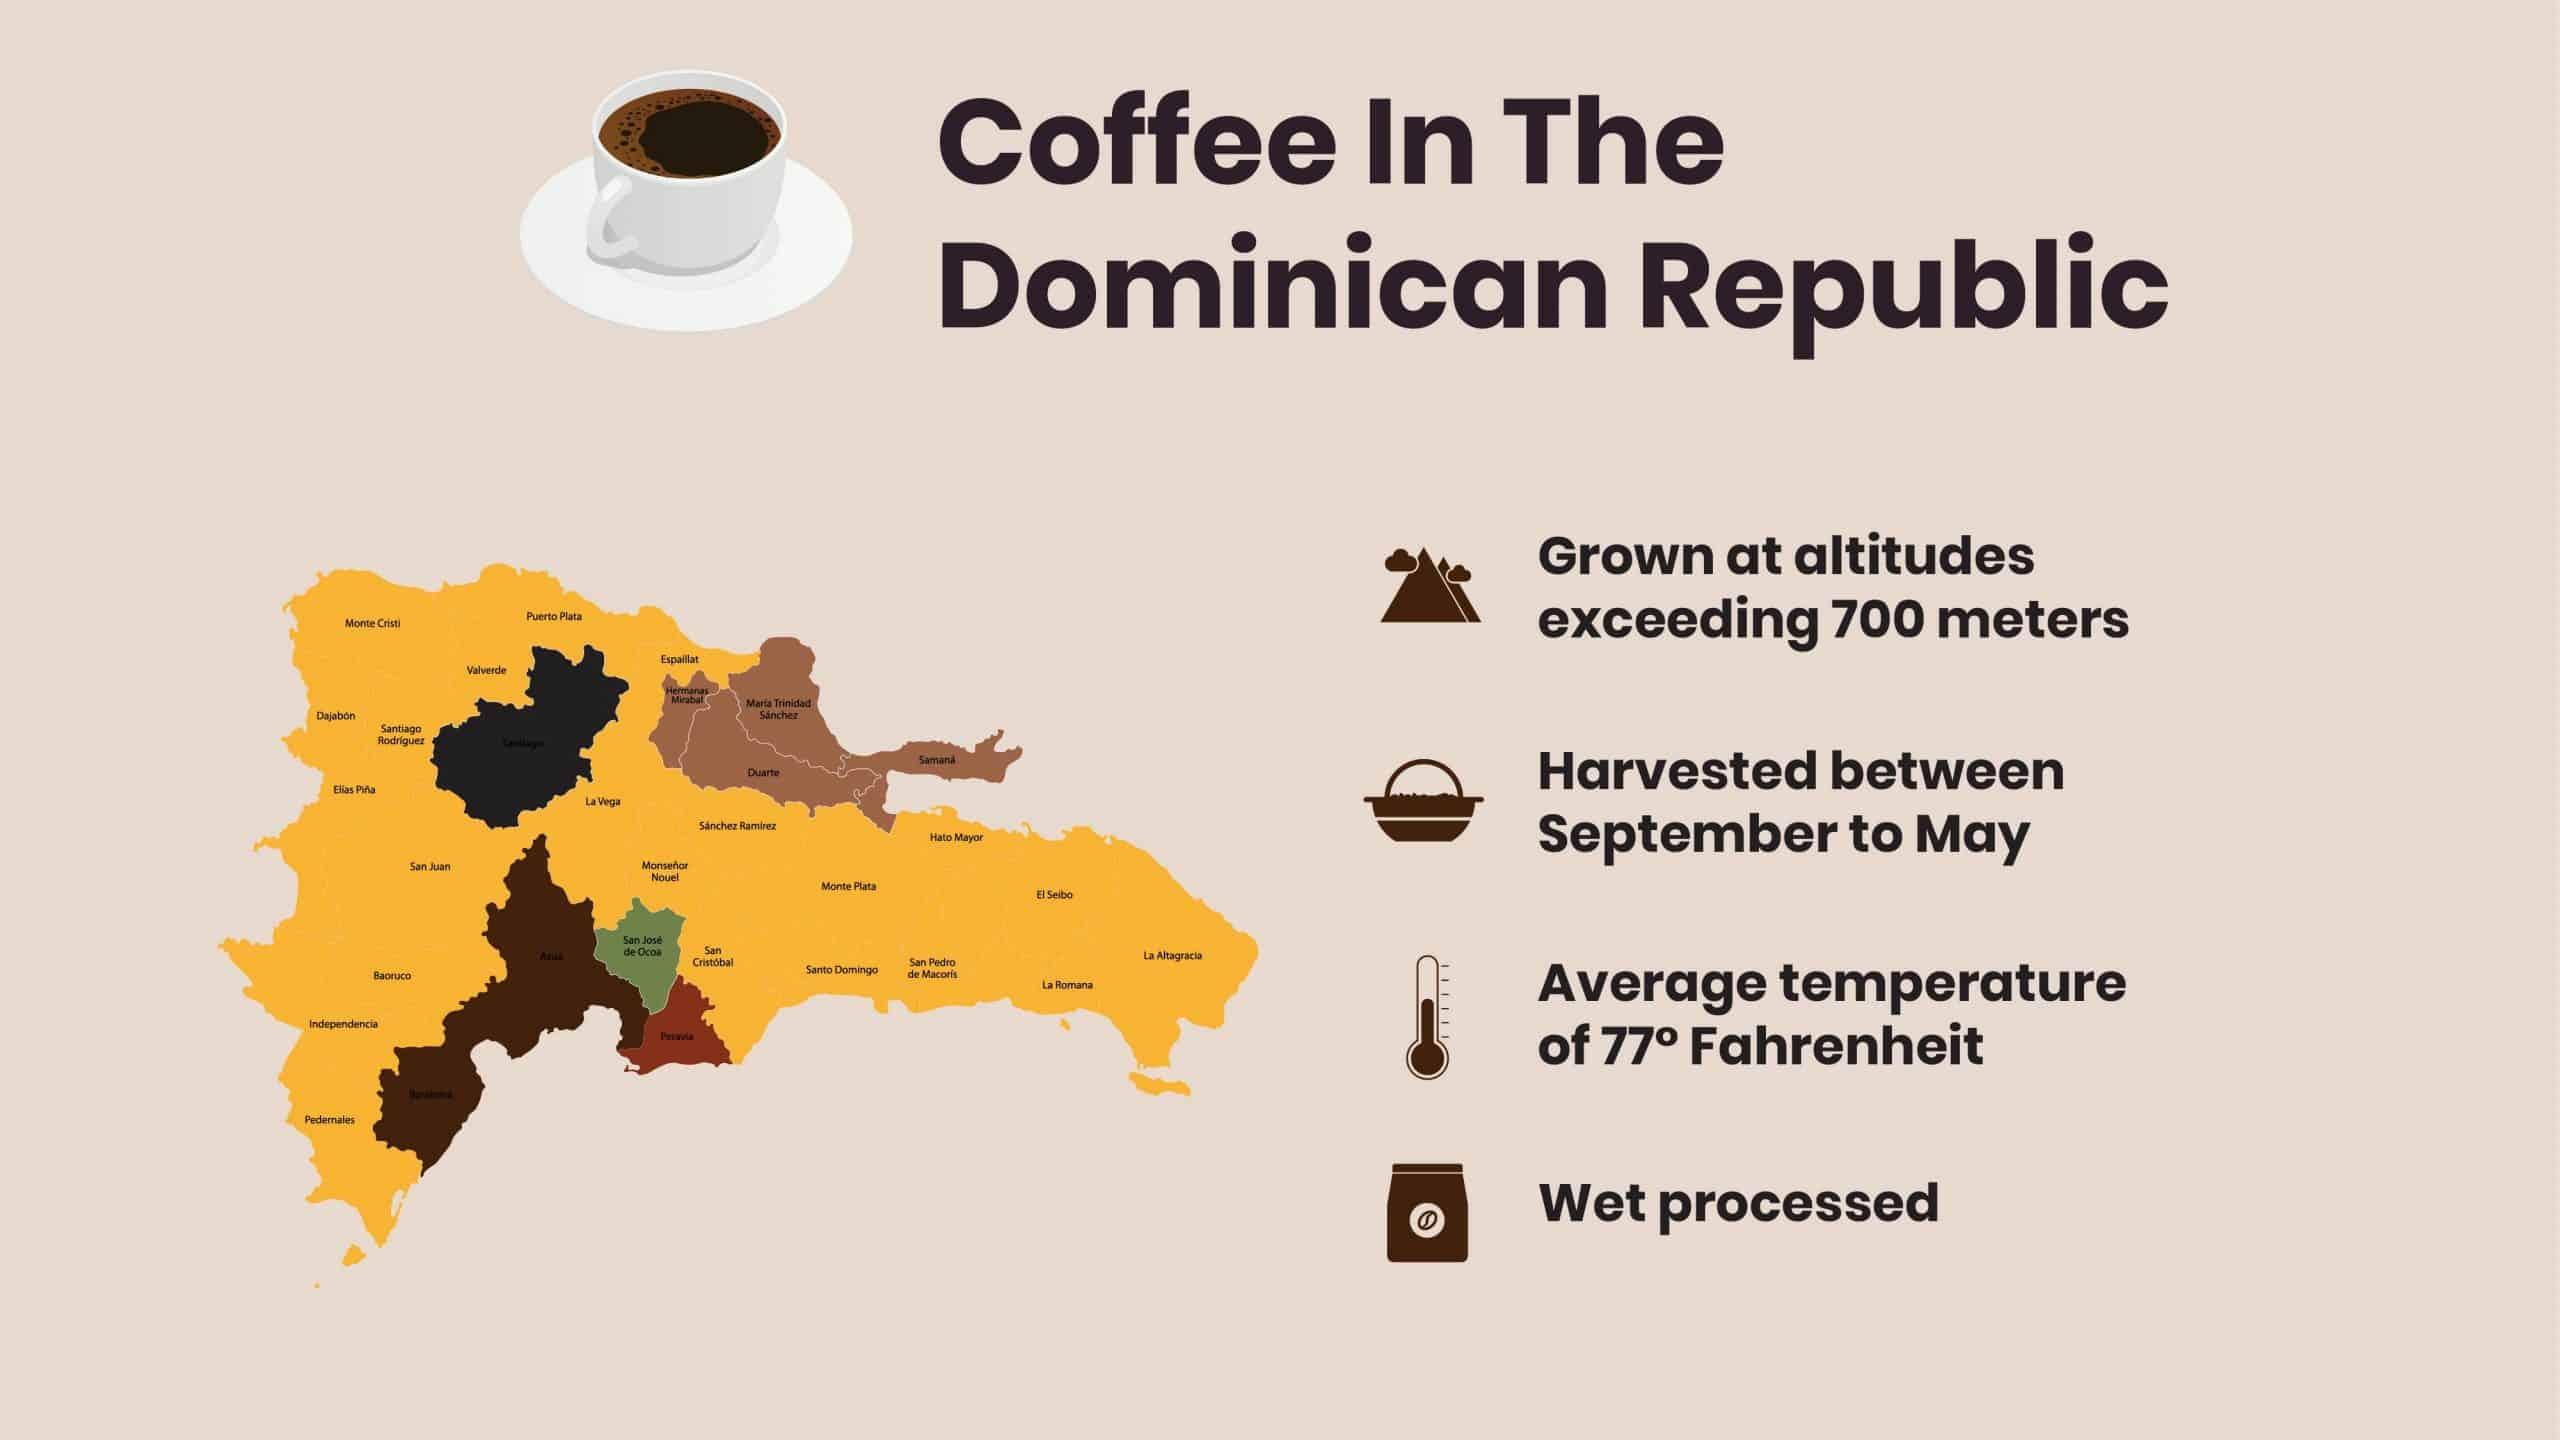 Dominican Republic Coffee facts